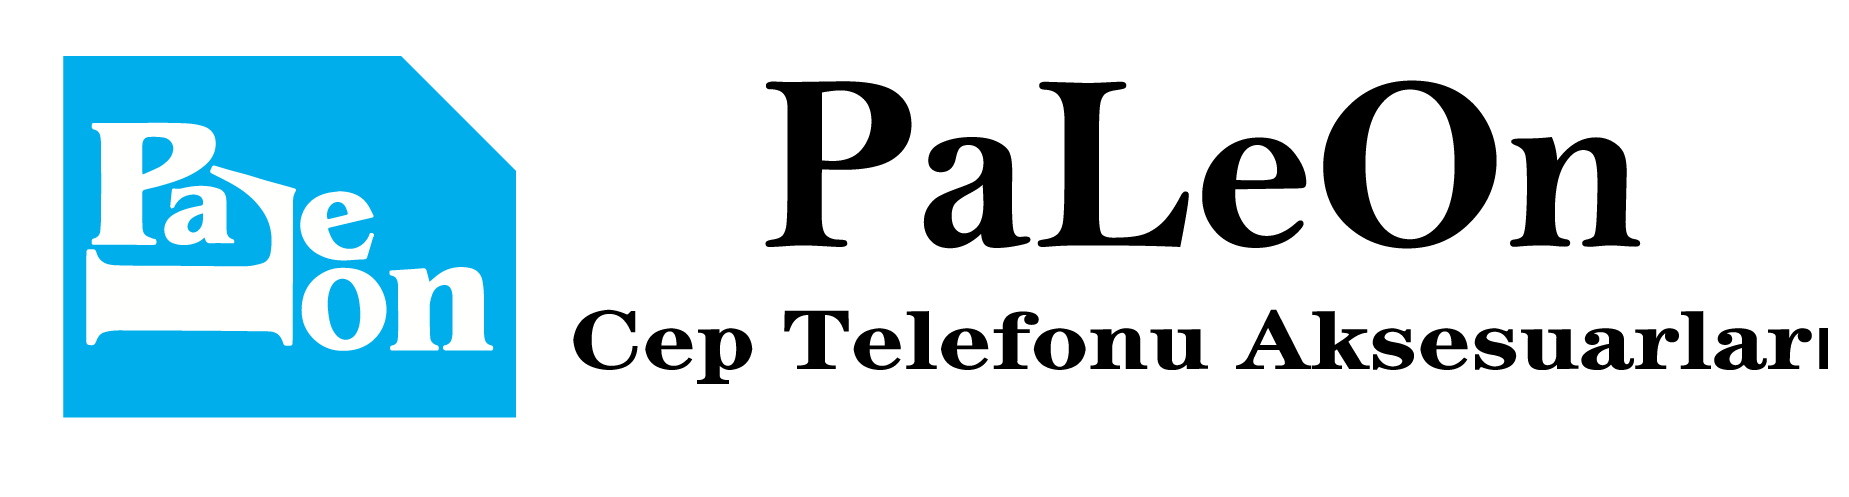 Paleon Gsm